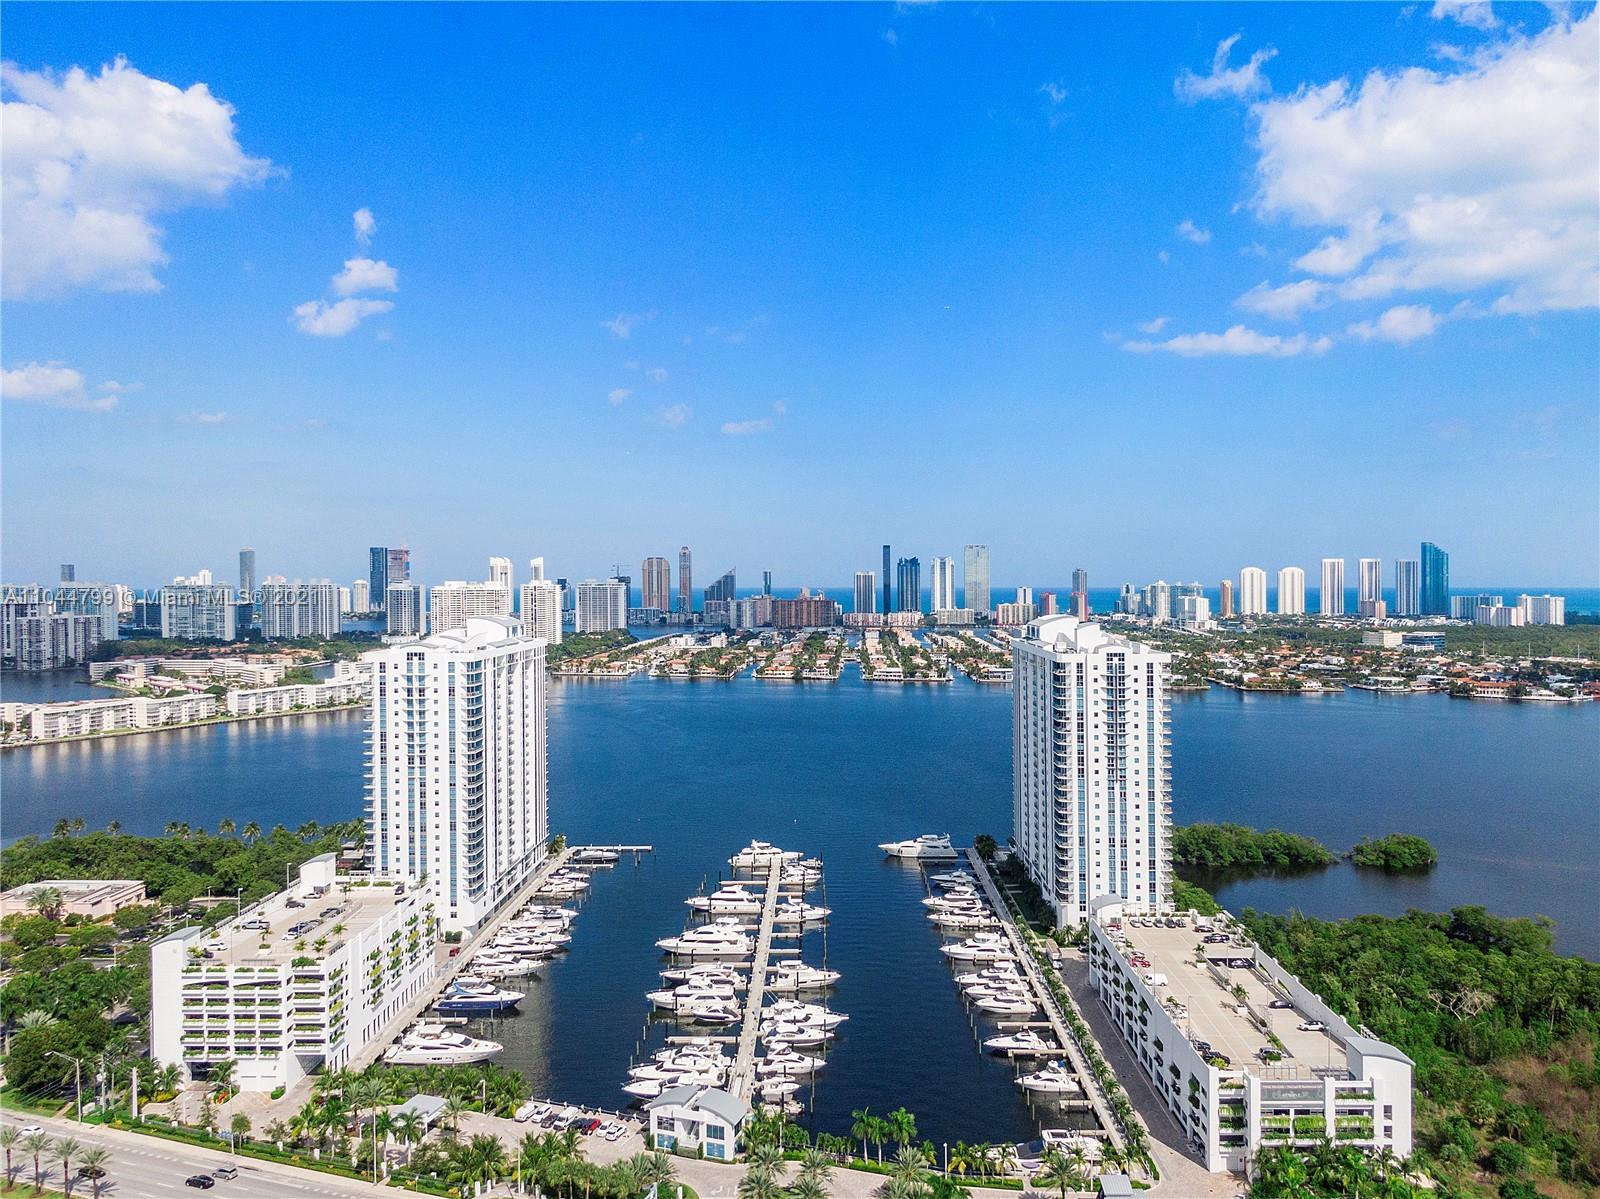 17211 Biscayne Blvd #86, Miami, Florida 33160